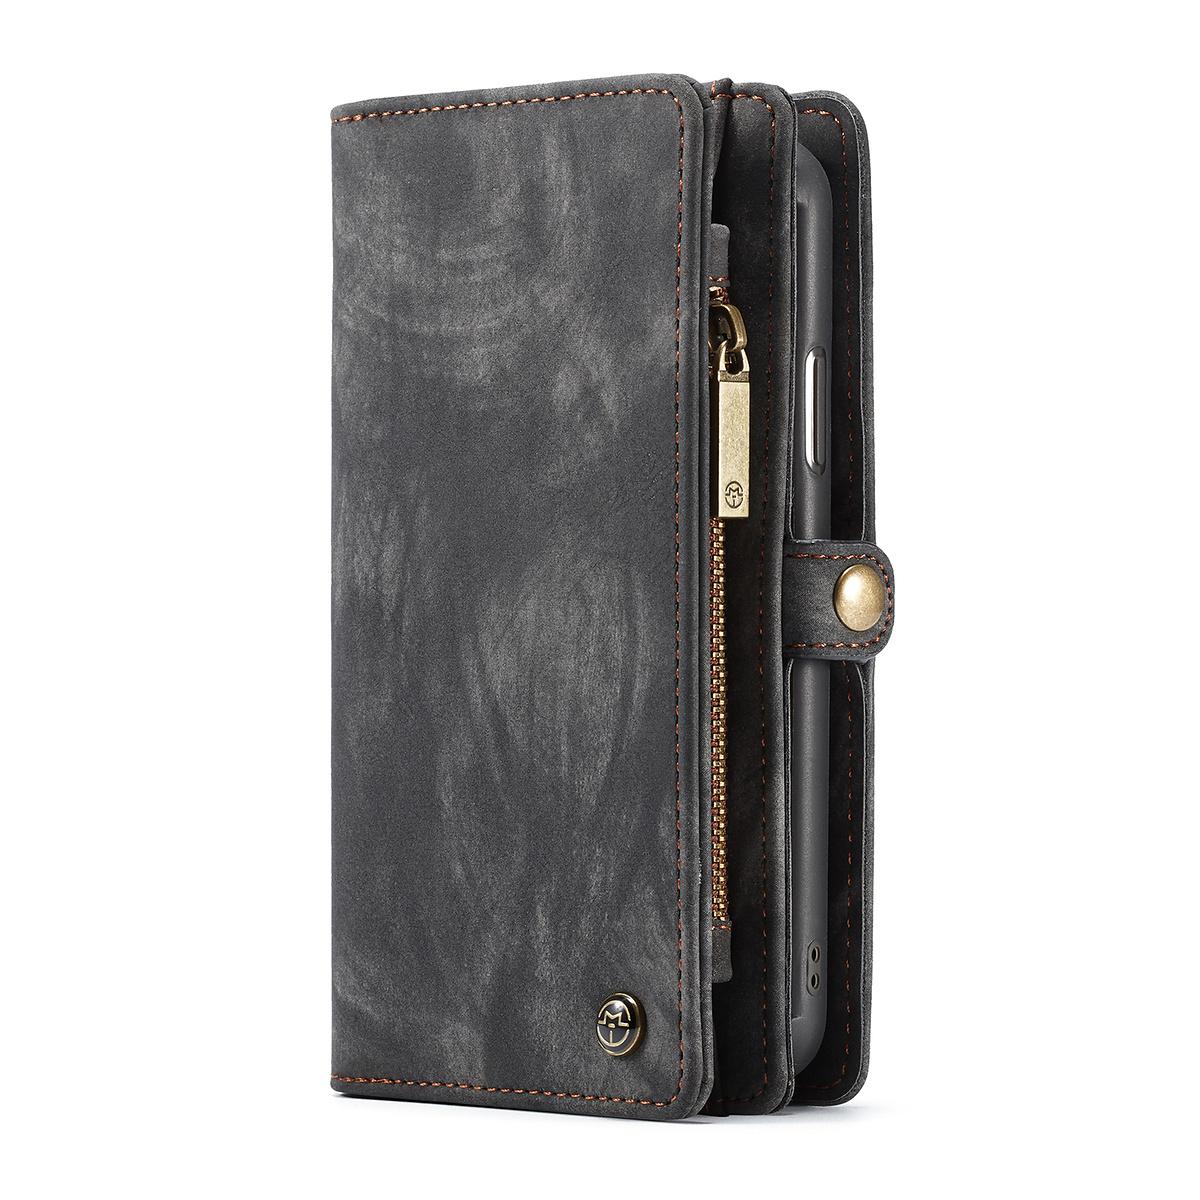 CaseMe plånboksfodral med magnetskal till iPhone XS Max, svart